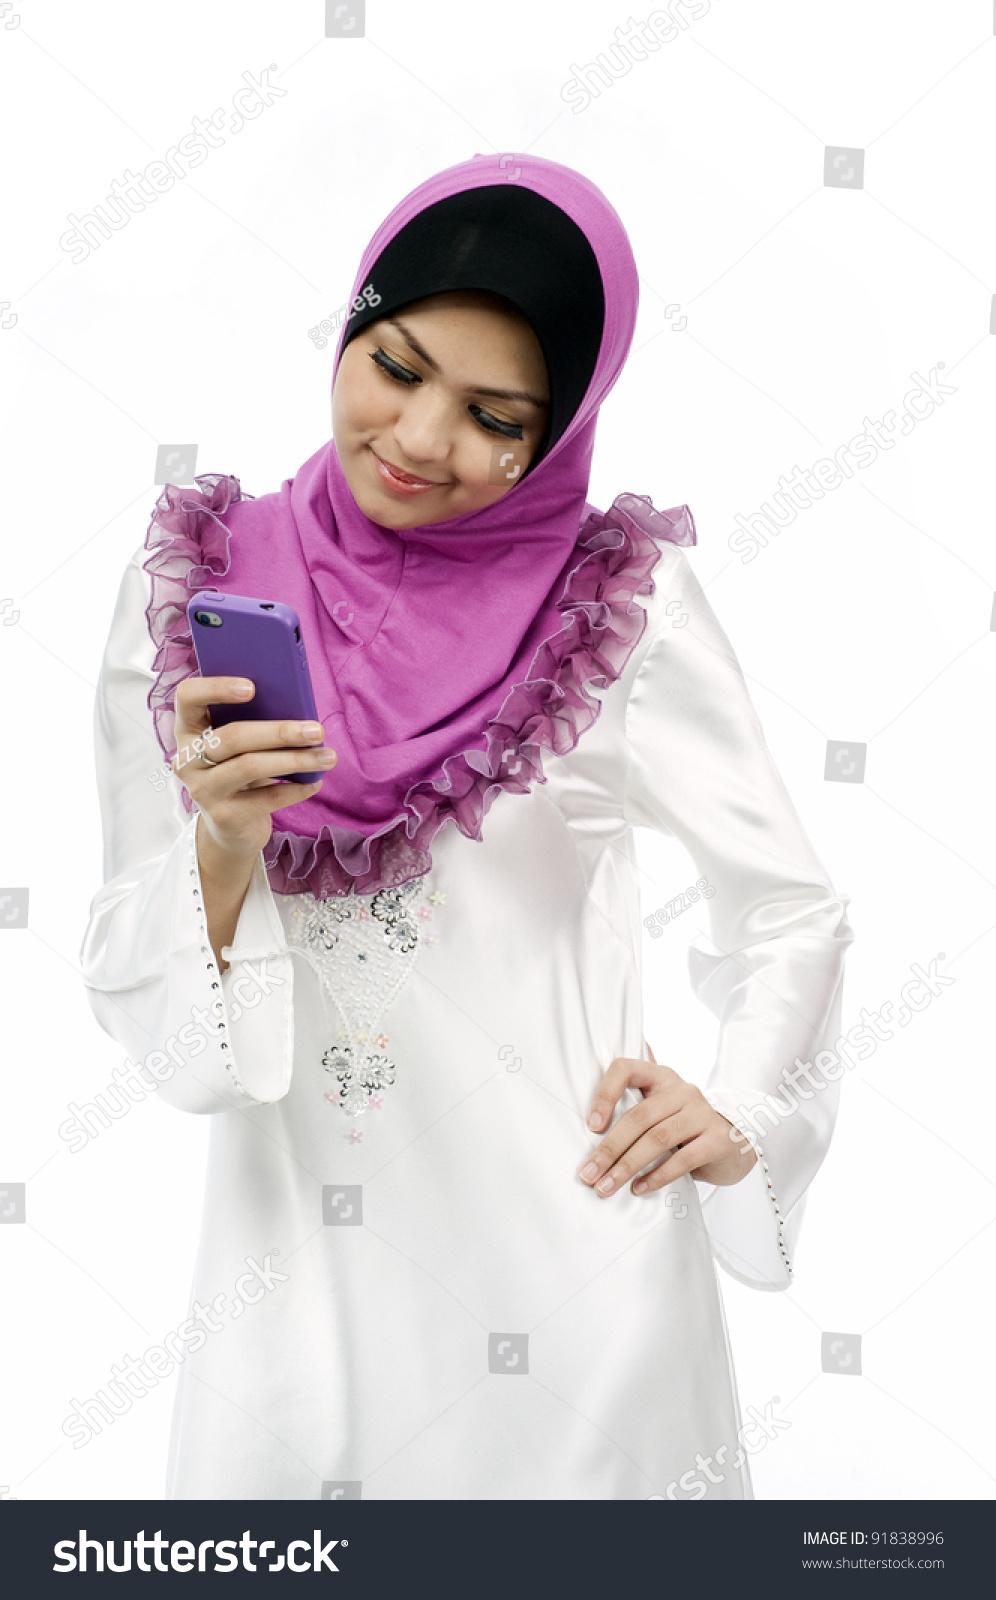 mobile muslim single women You can meet arab singles at arablounge muslim men muslim singles muslim women single young arab dating mobile site | desktop site magazine.